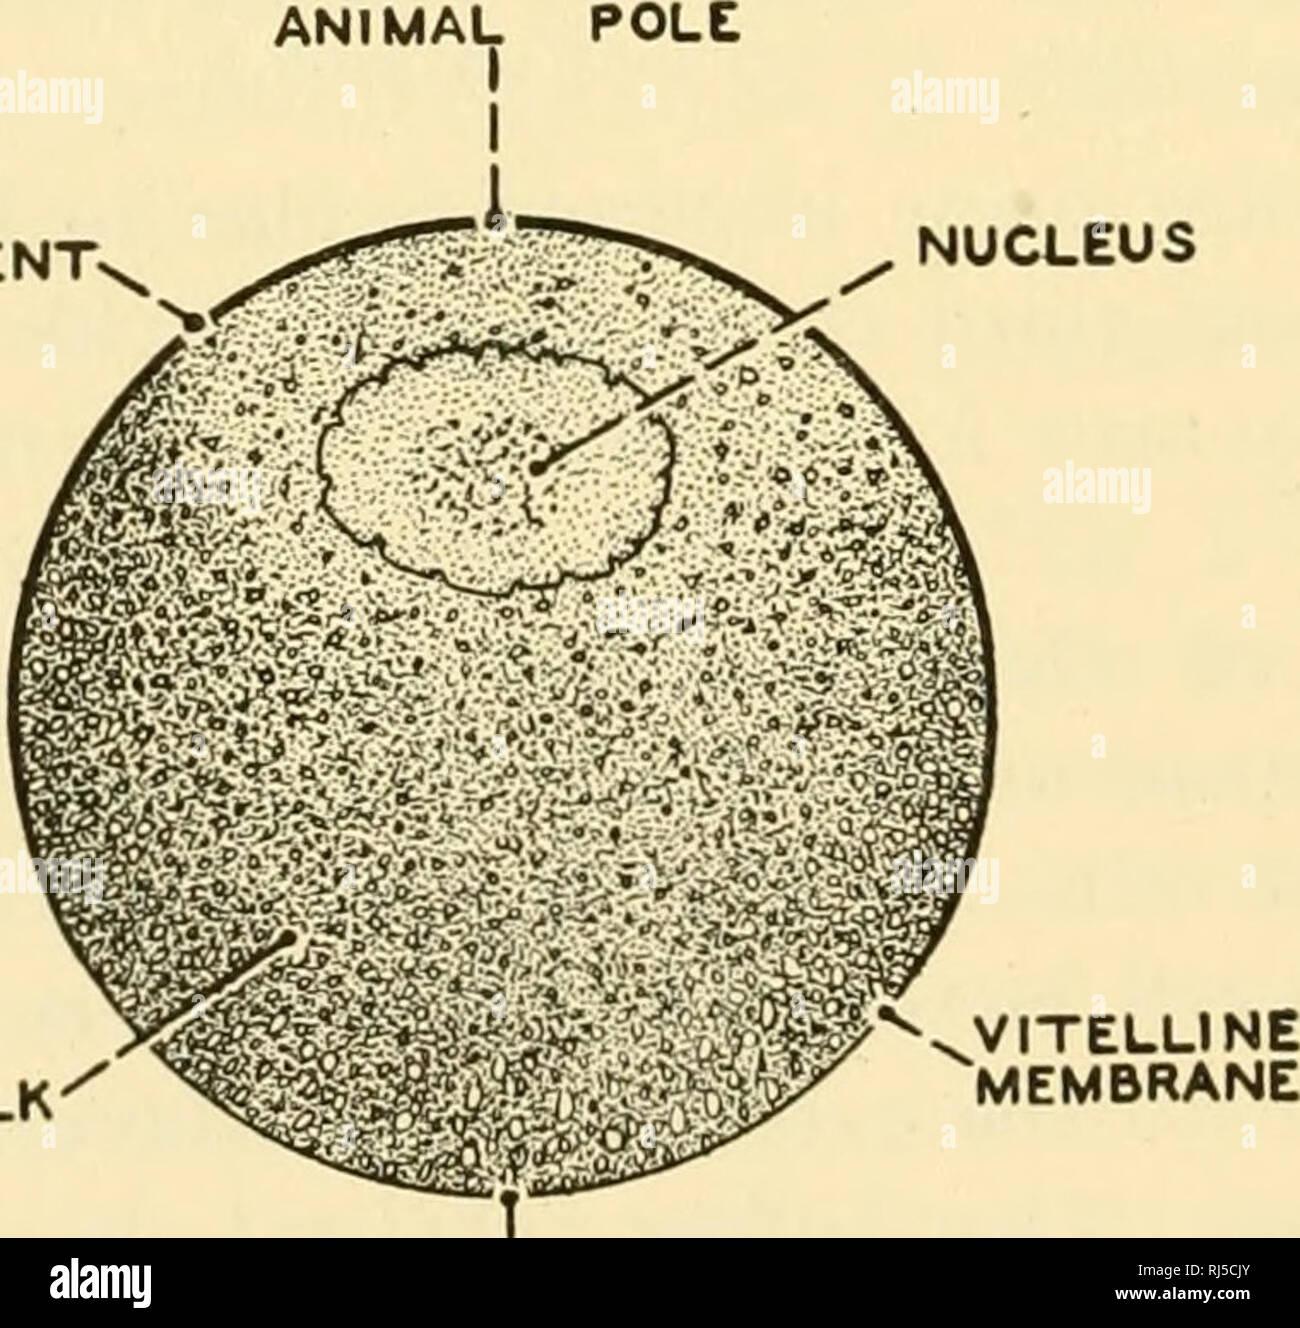 Chordate Anatomy Chordata Anatomy Comparative Pigment Nucleus